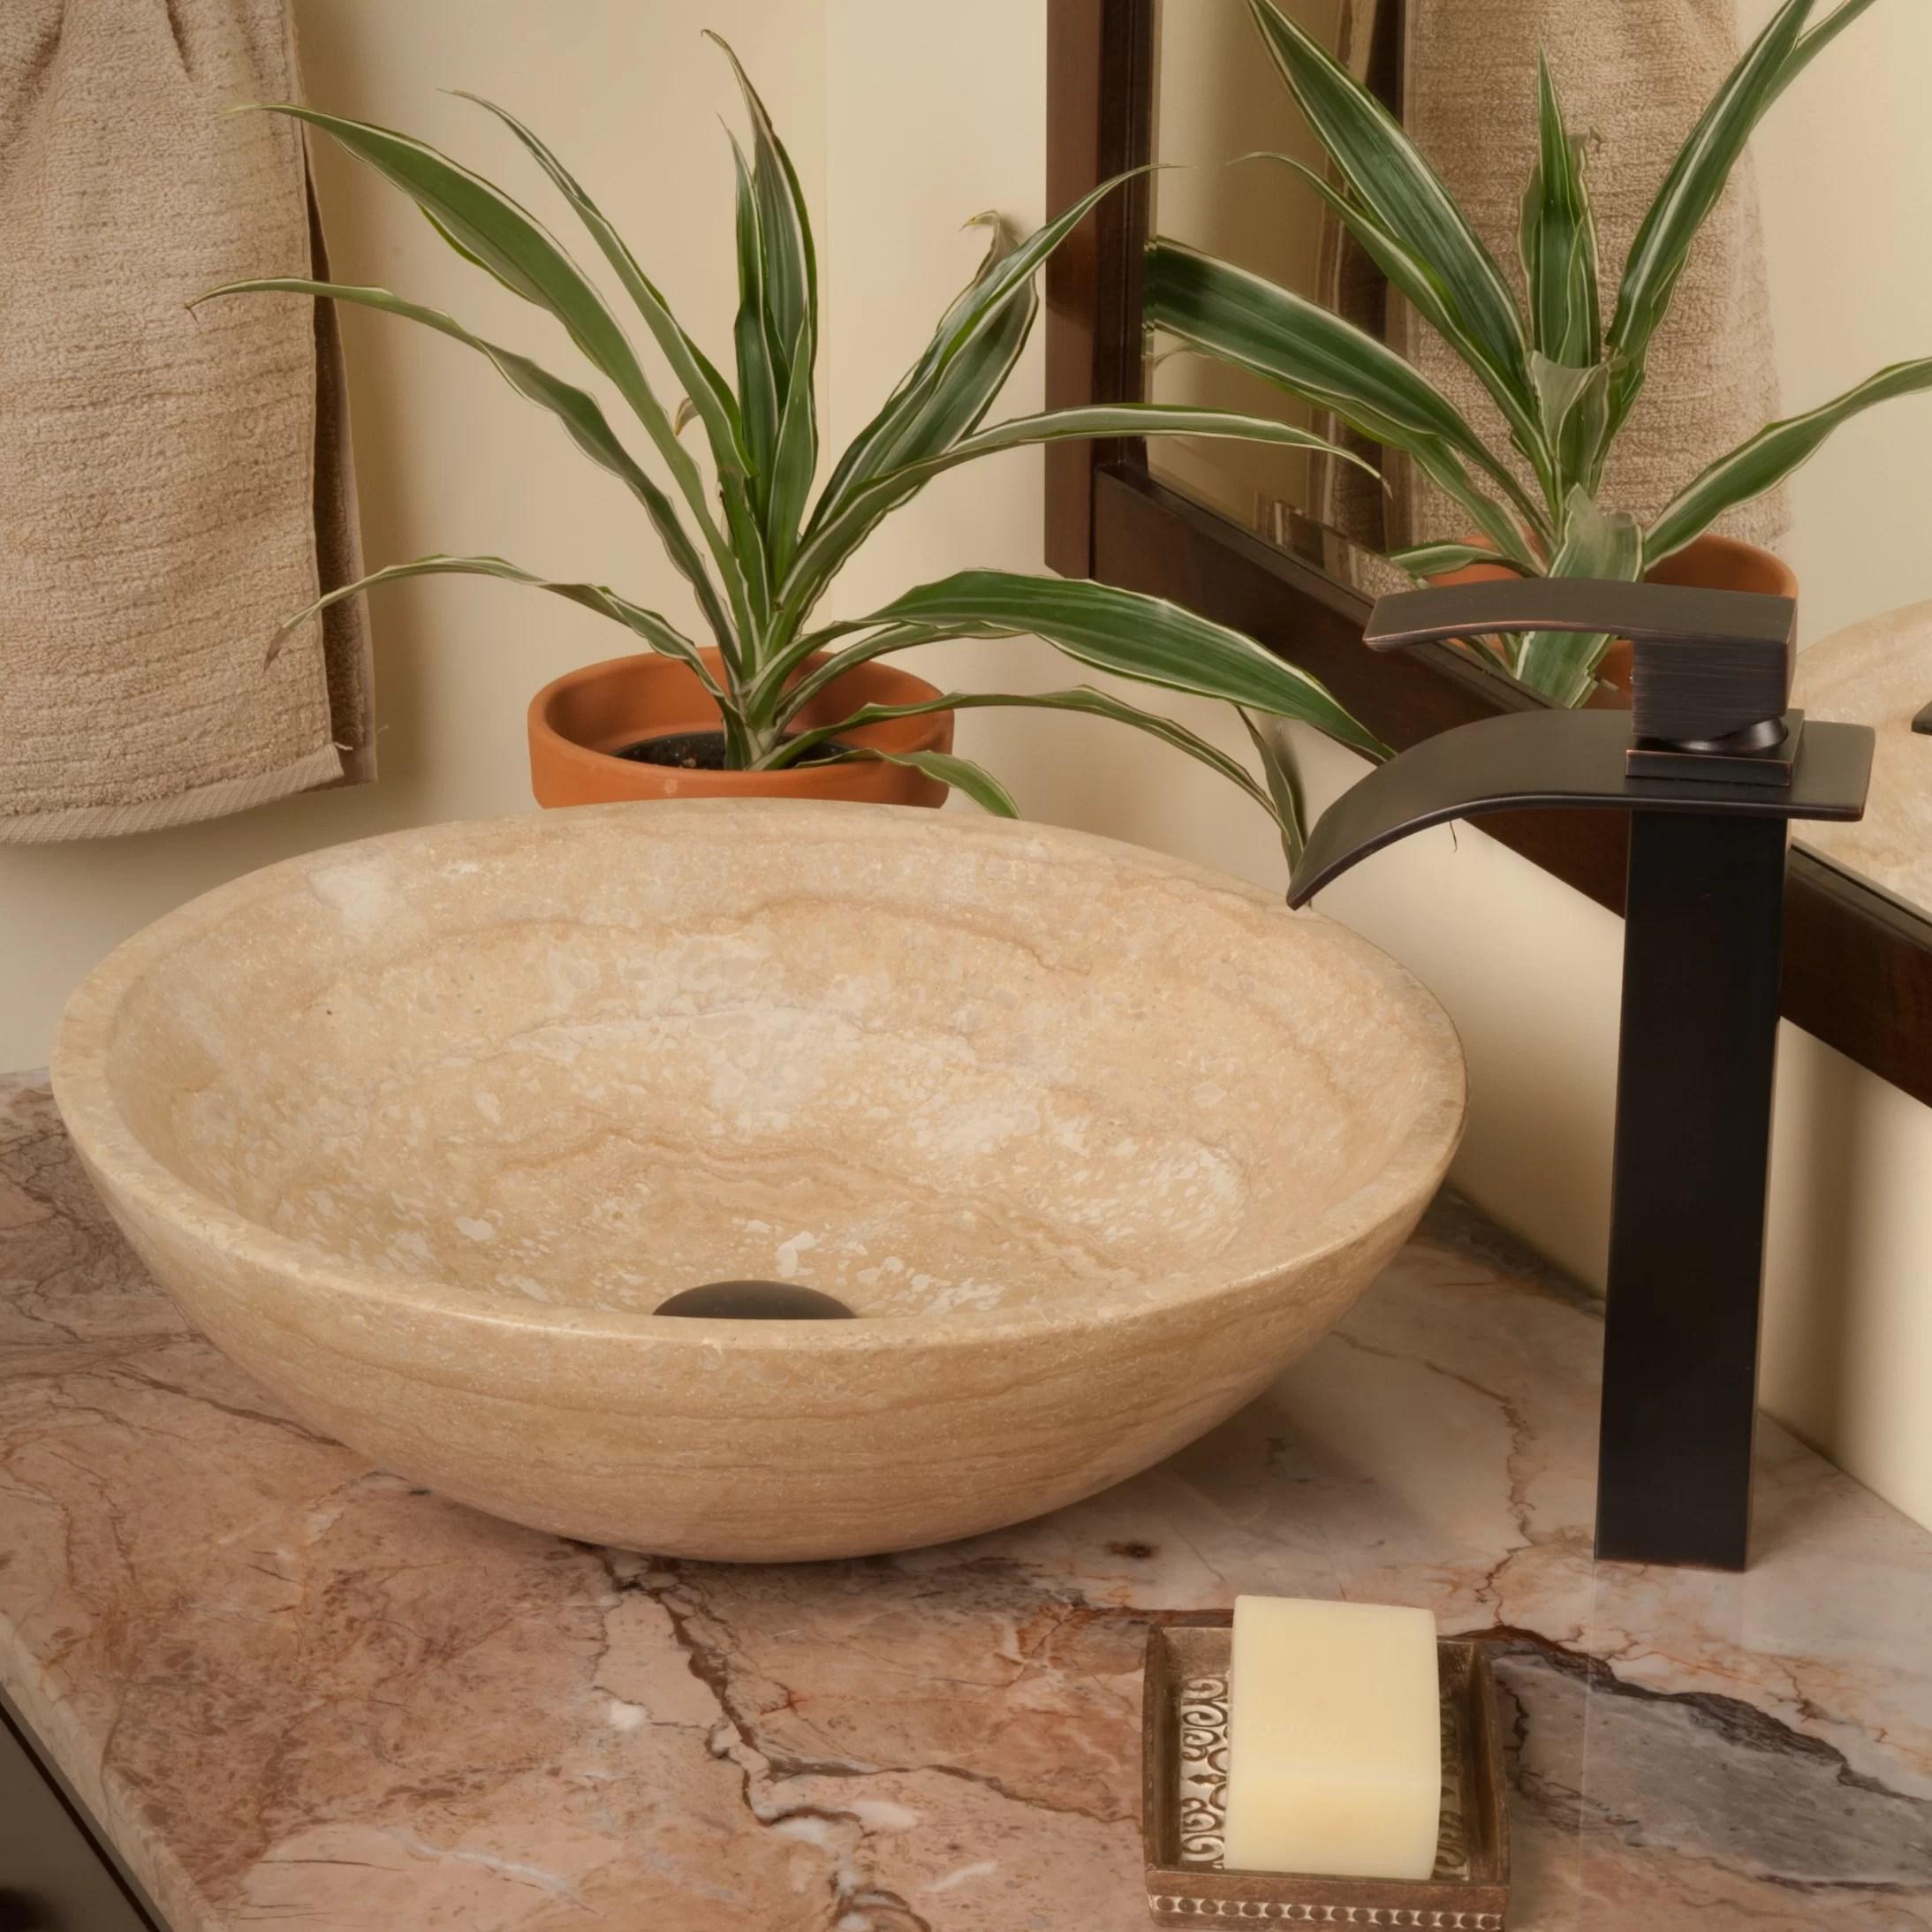 beige travertine stone circular vessel bathroom sink with faucet